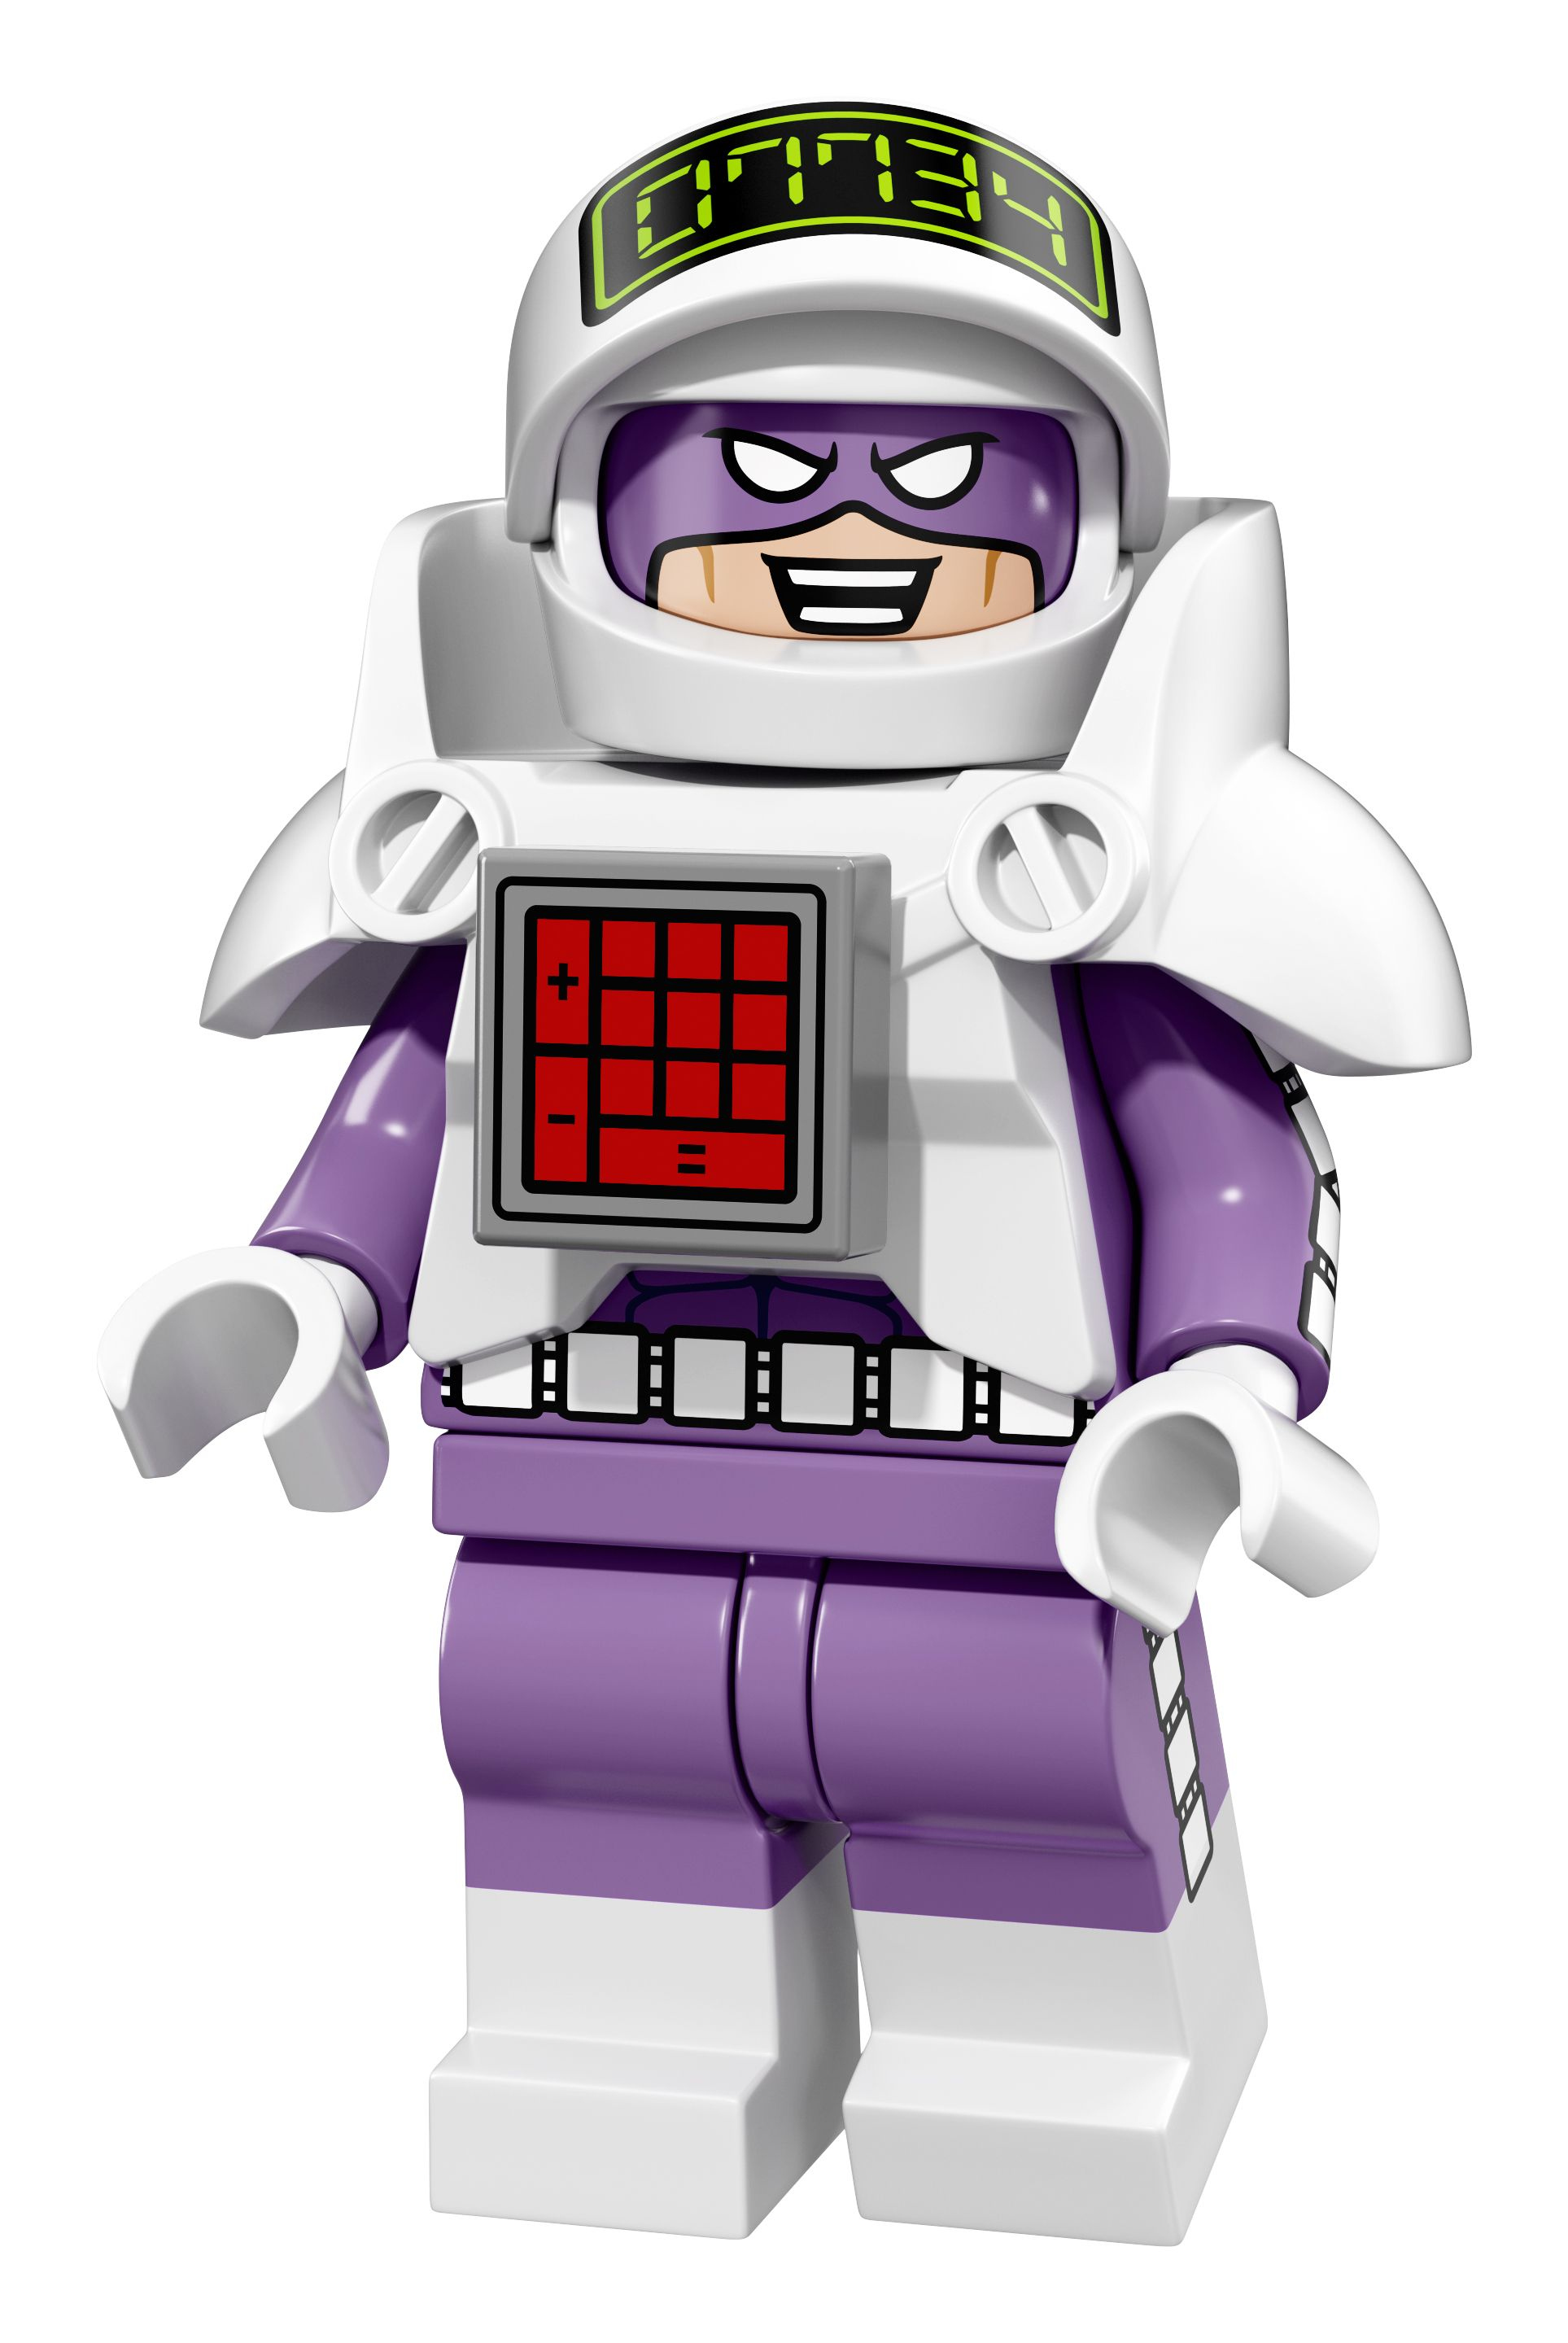 LEGO NEW BATMAN MOVIE SERIES Evil Orca MINIFIGURE 71017 FIGURE